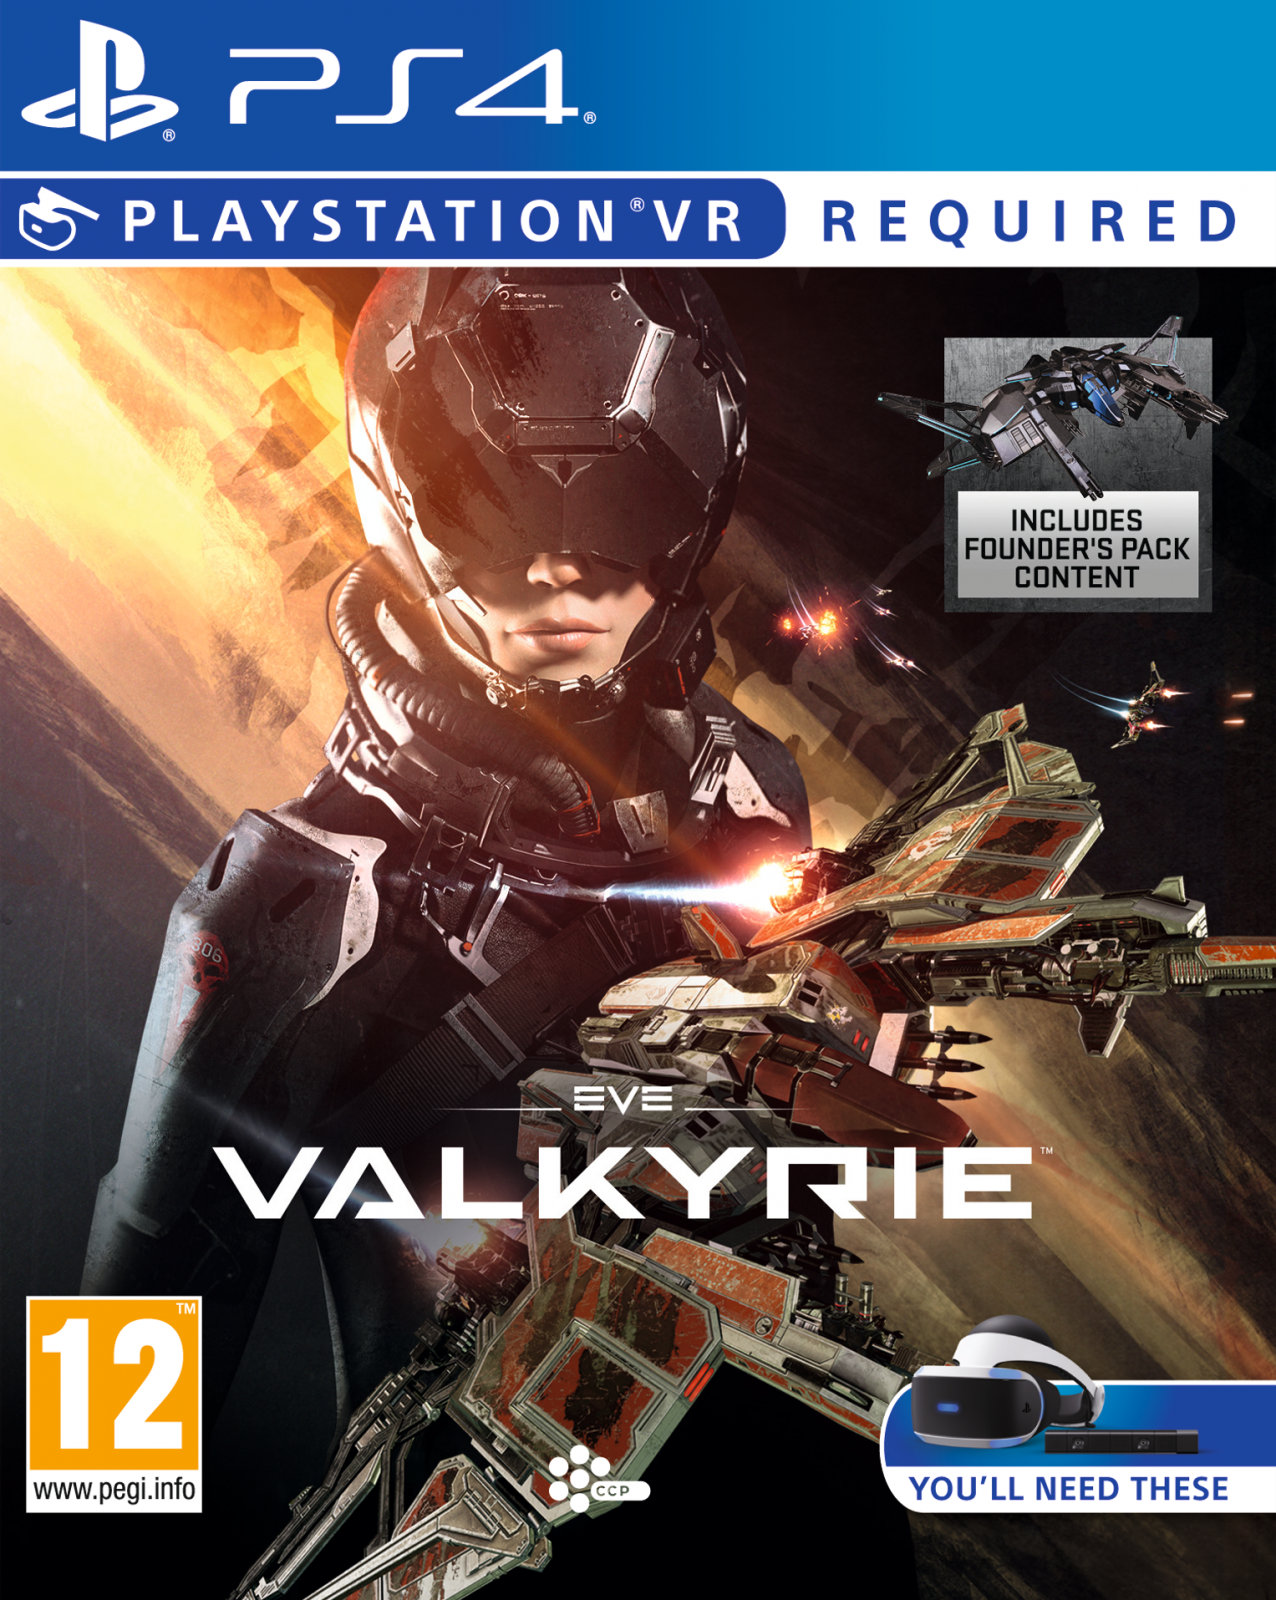 Eve Valkyrie PSVR VR HEADSET |